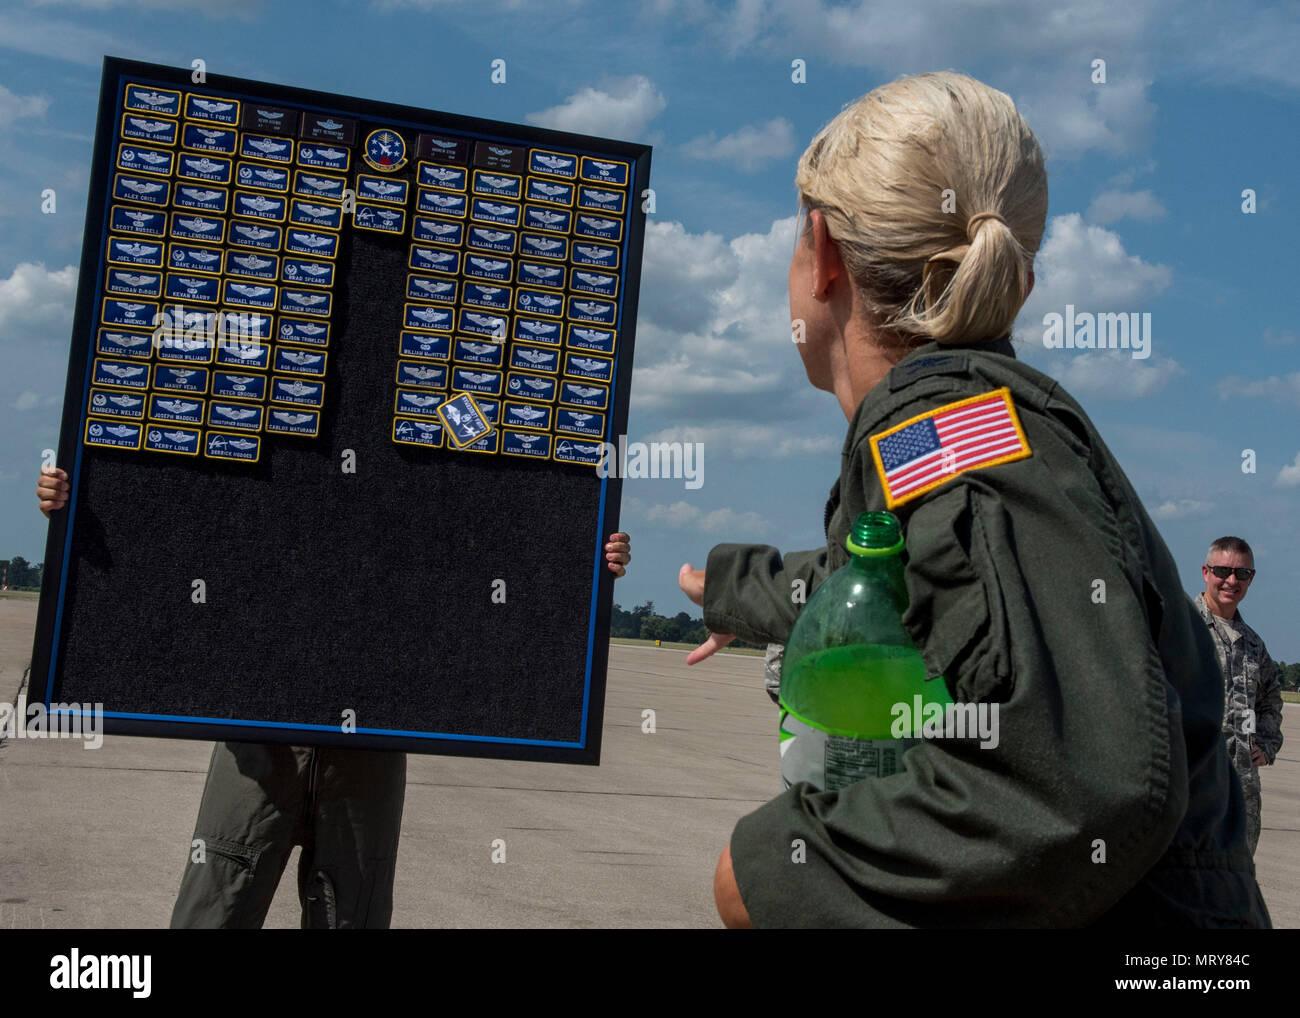 3c5f7459d Col. Laura Lenderman